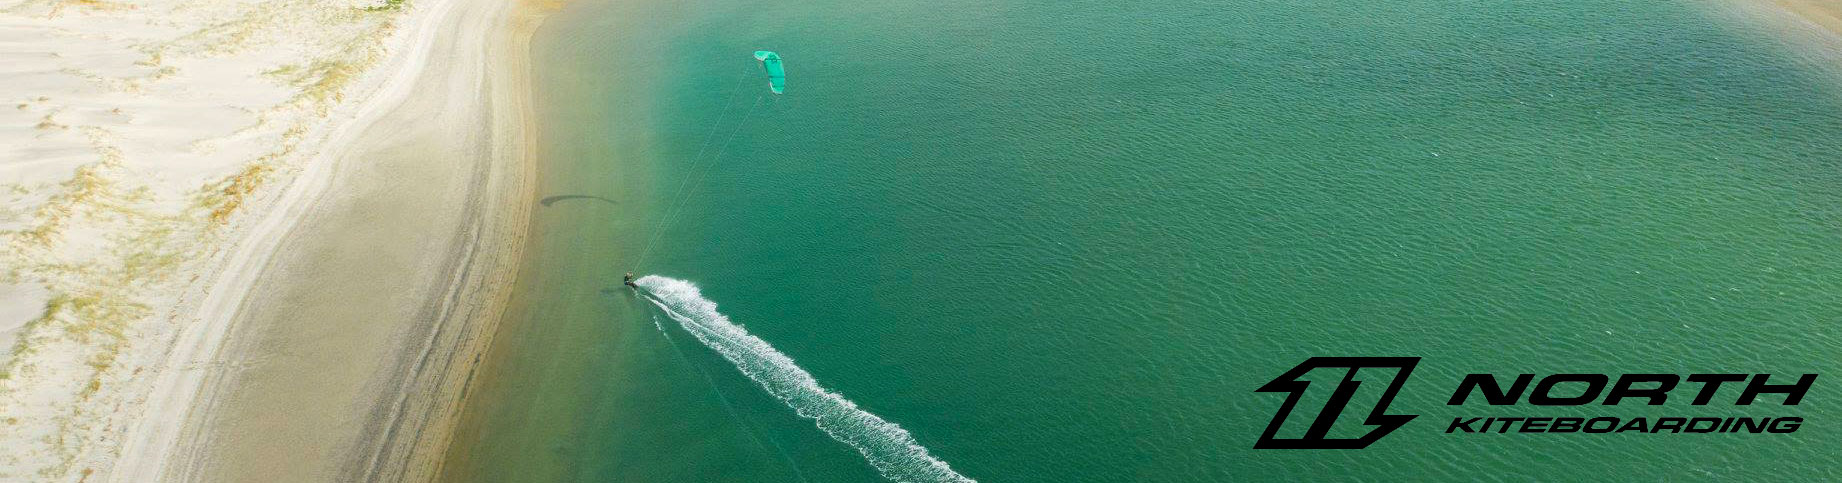 North Kiteboarding est devenu Duotone Kiteboarding